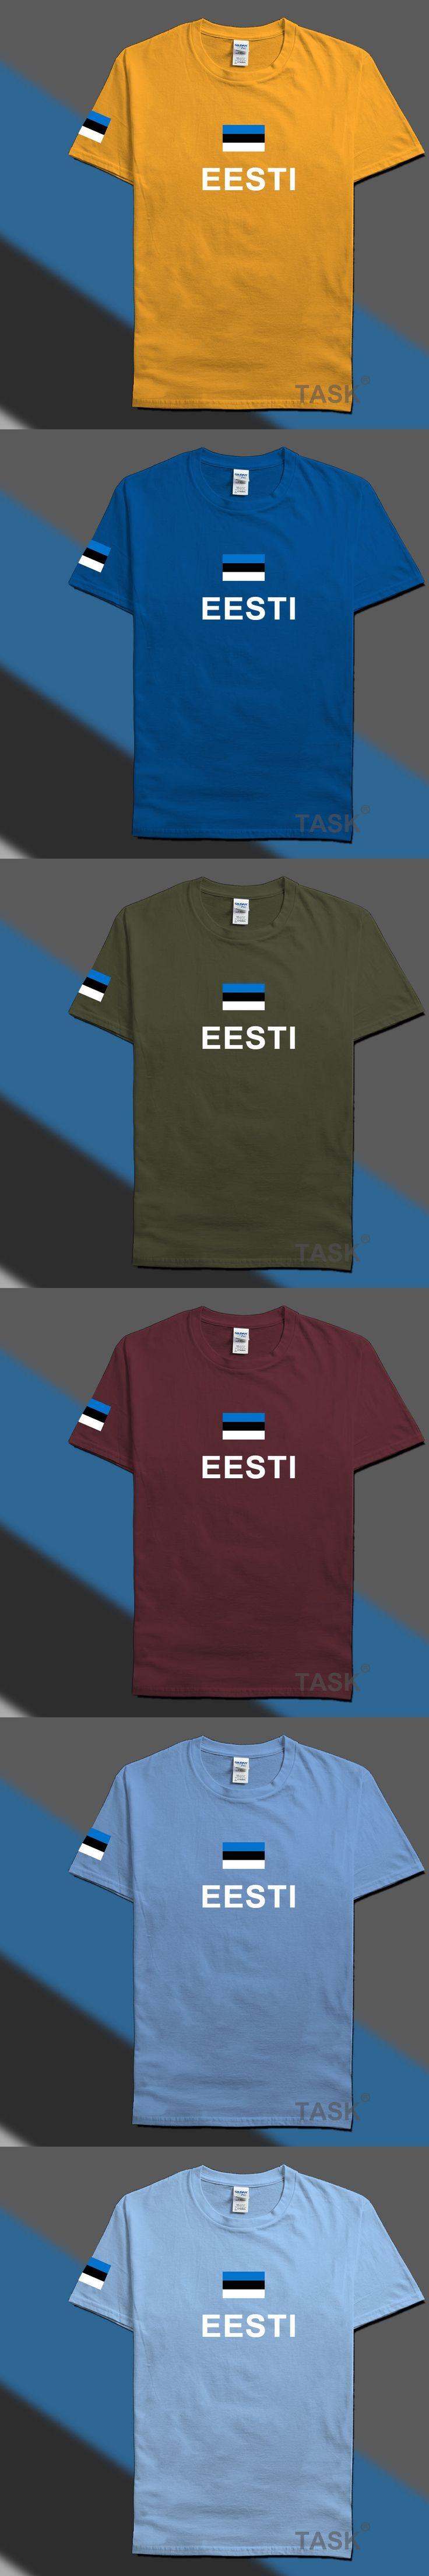 Estonia Estonian mens t shirts fashion 2017 jerseys' nation 100% cotton t-shirt clothing tees country sporting flags EST Eesti